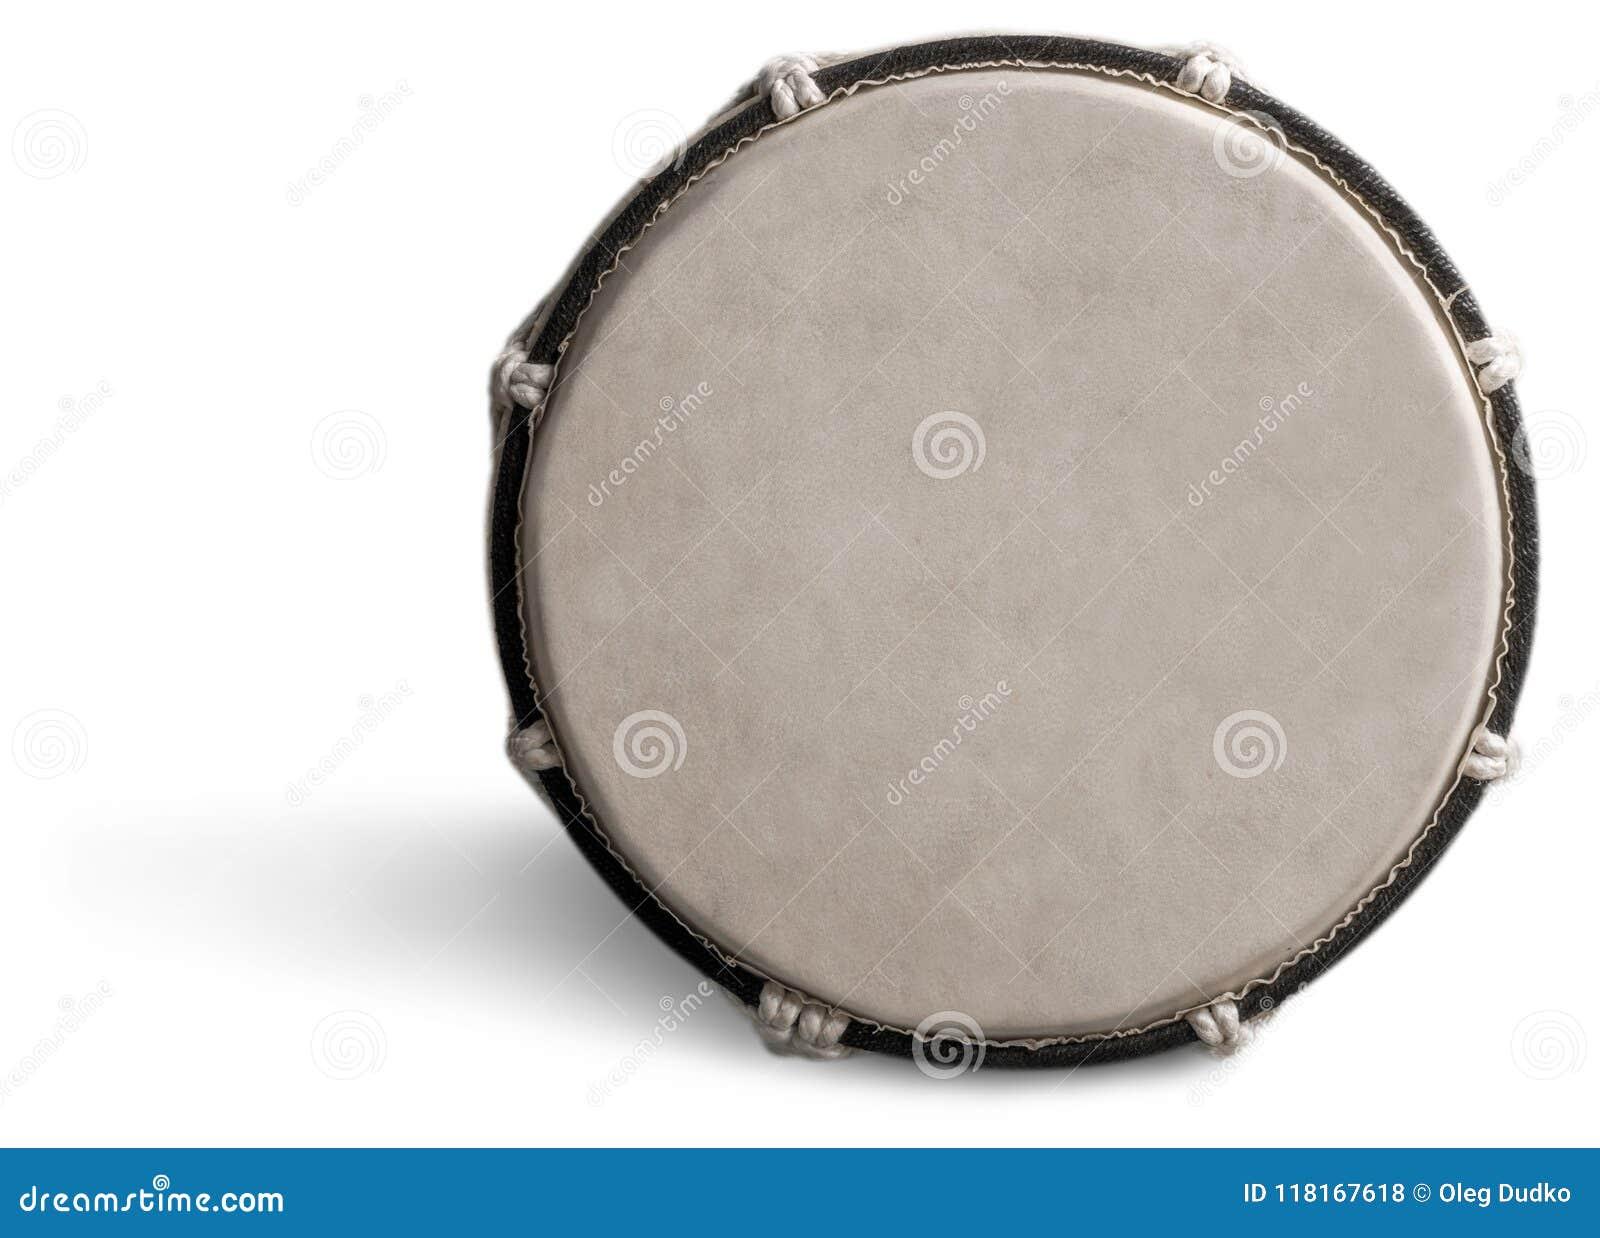 Drum stock photo  Image of instrument, sound, mahogany - 118167618